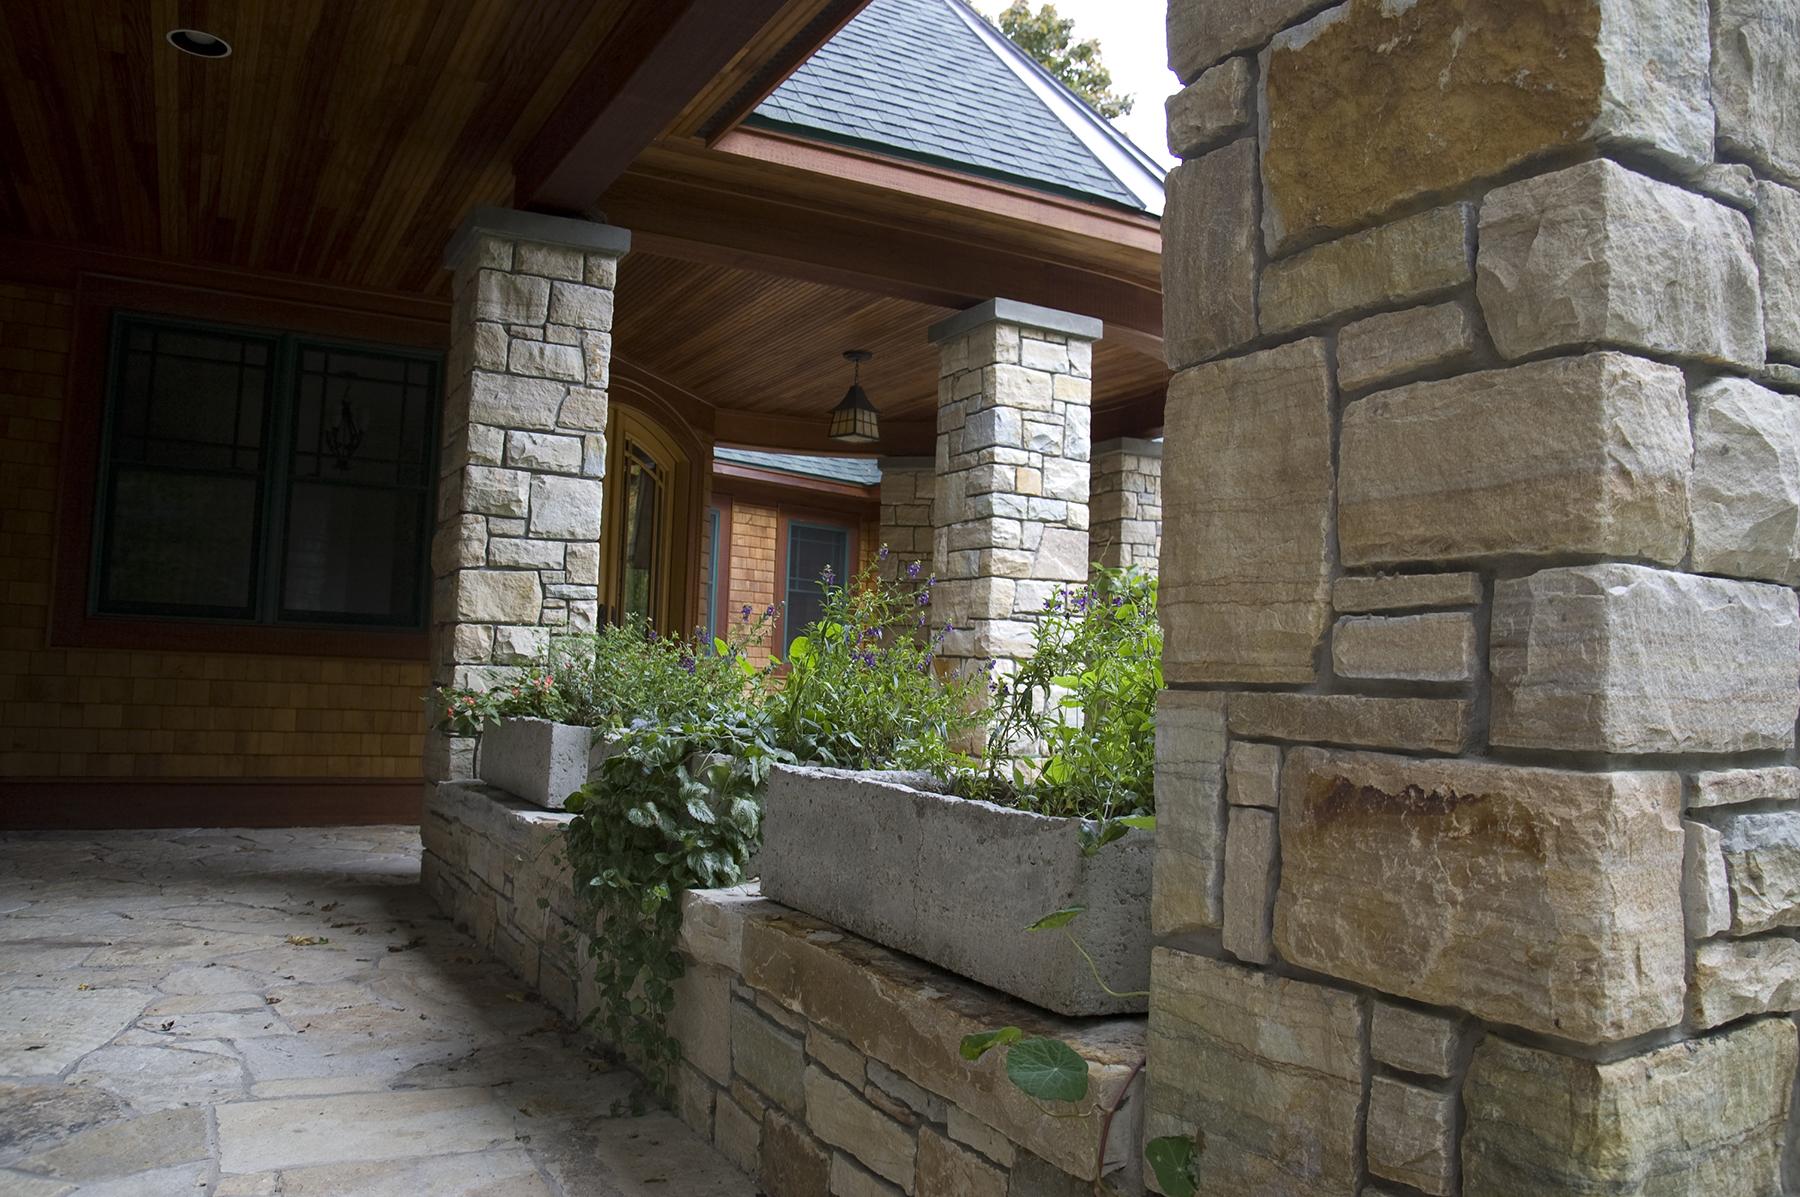 stone hallway and columns